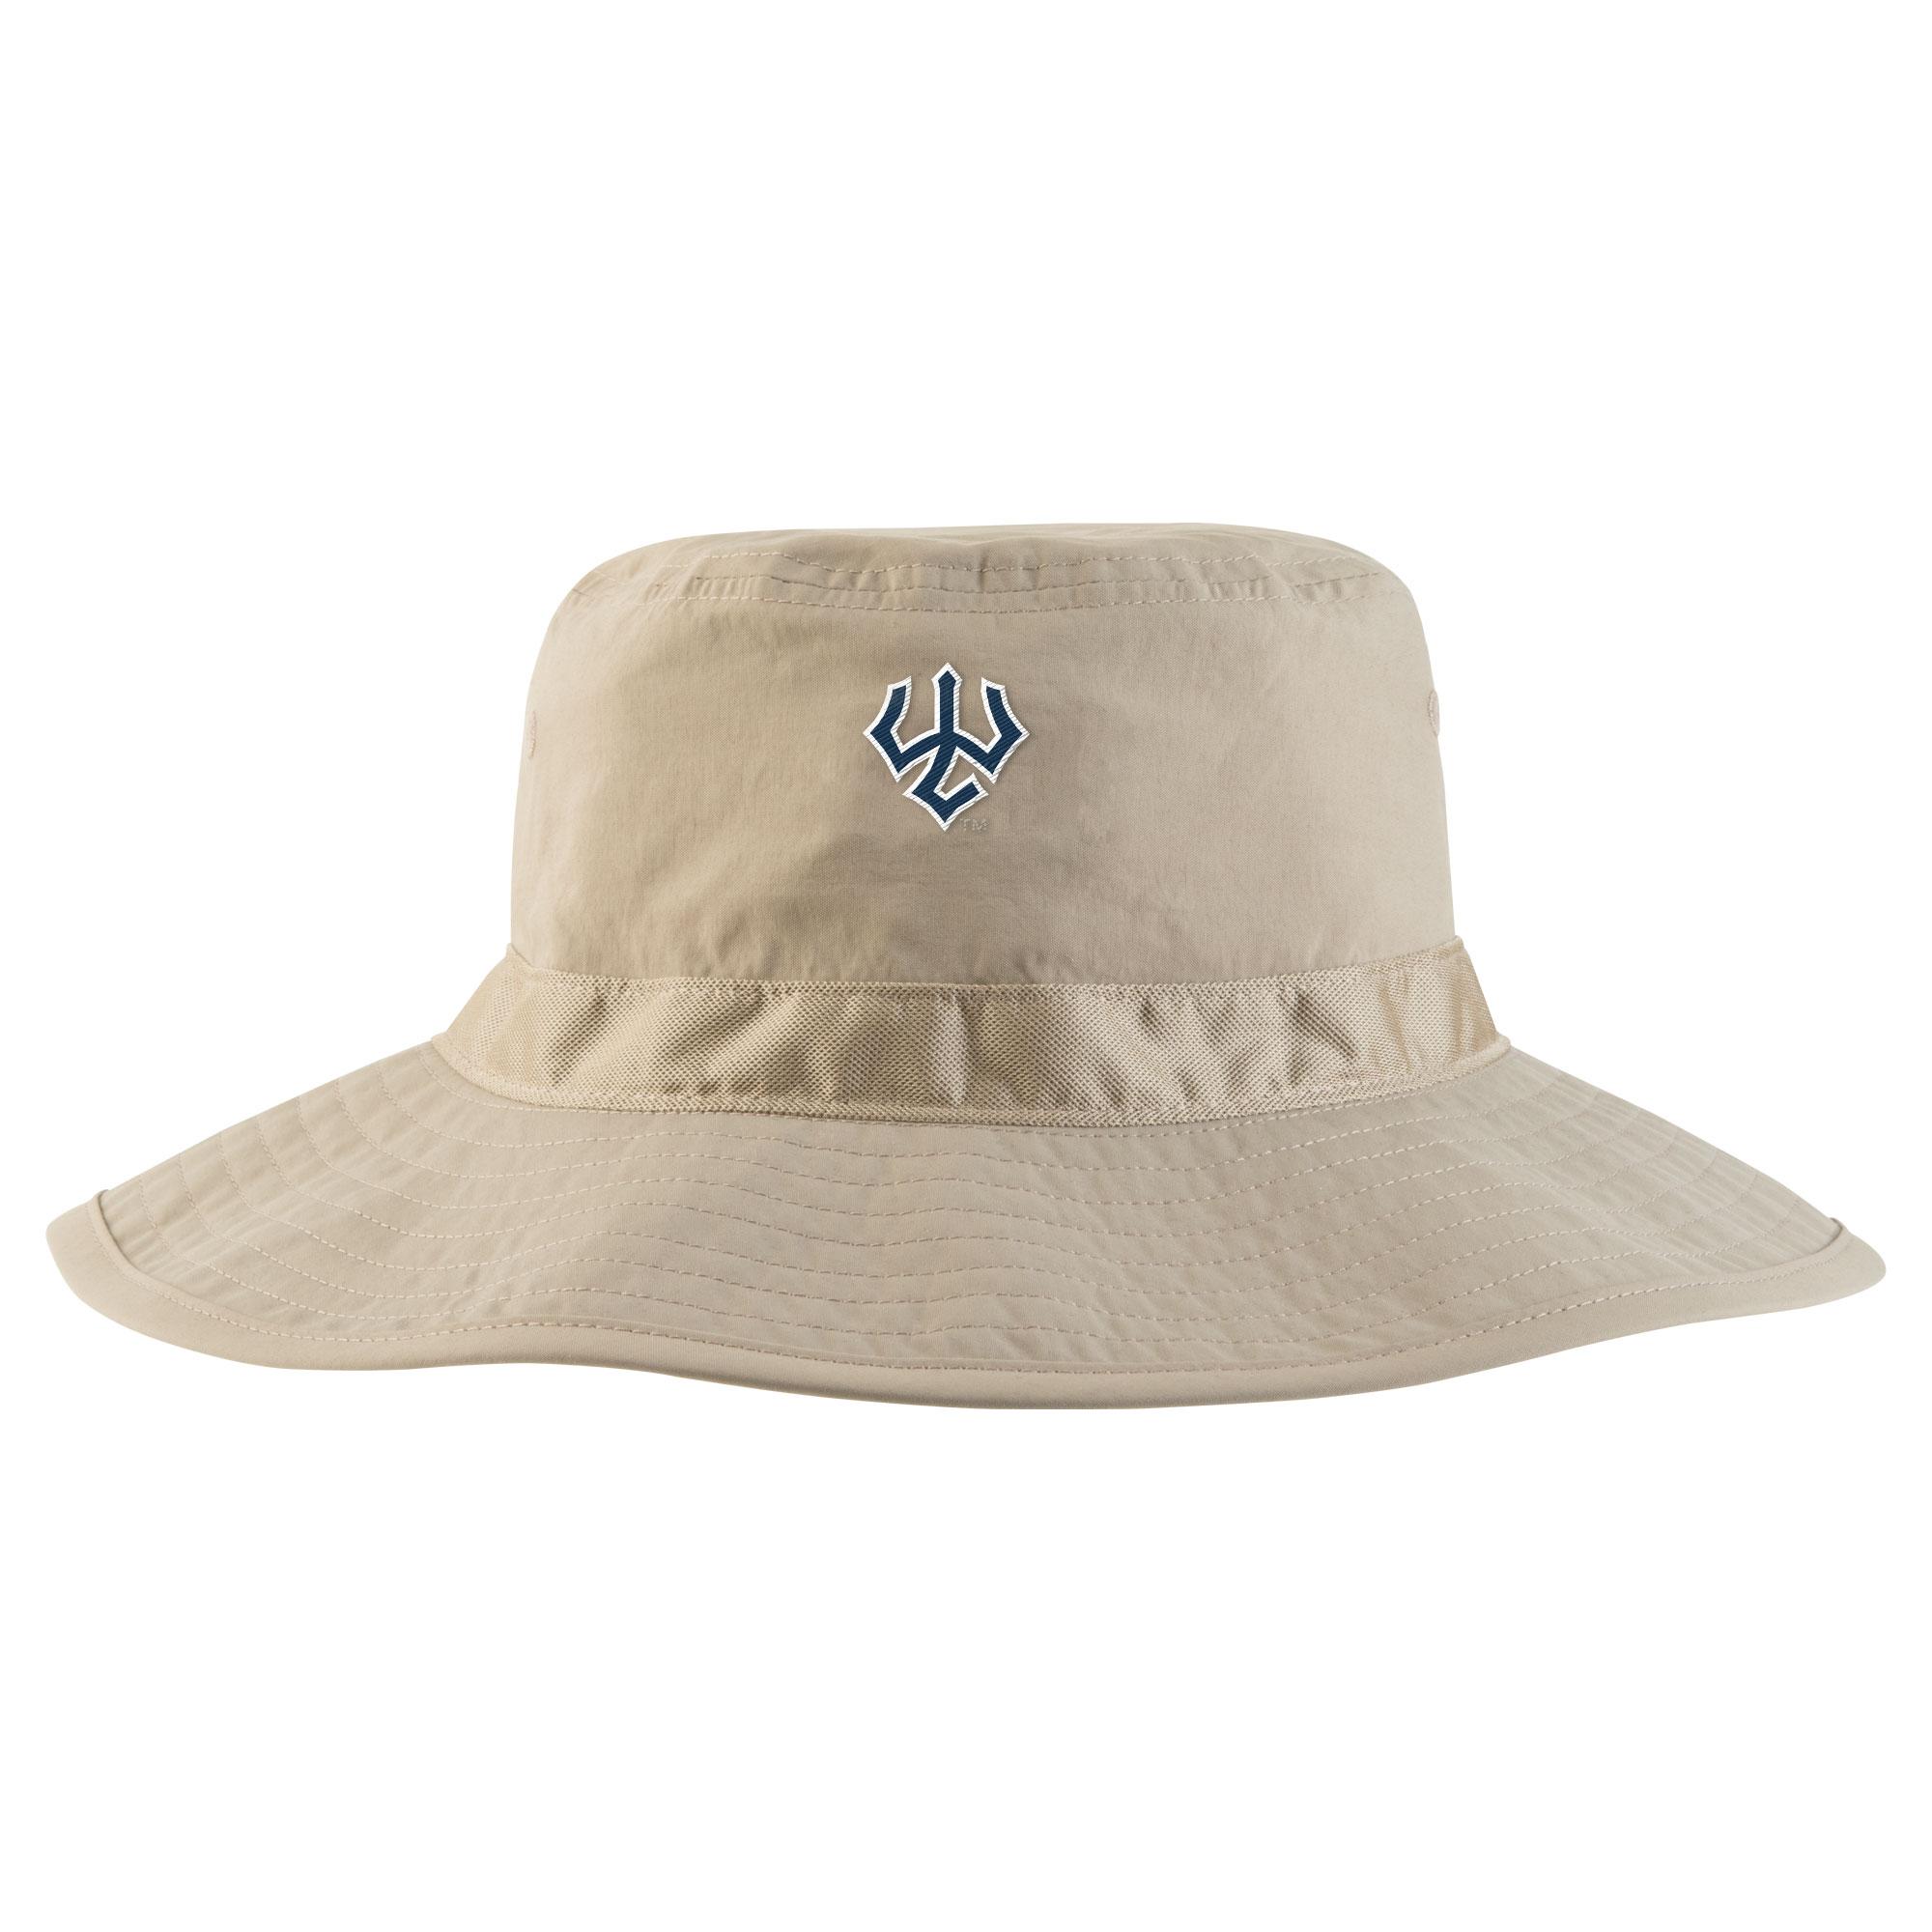 Nike Sideline Bucket Hat